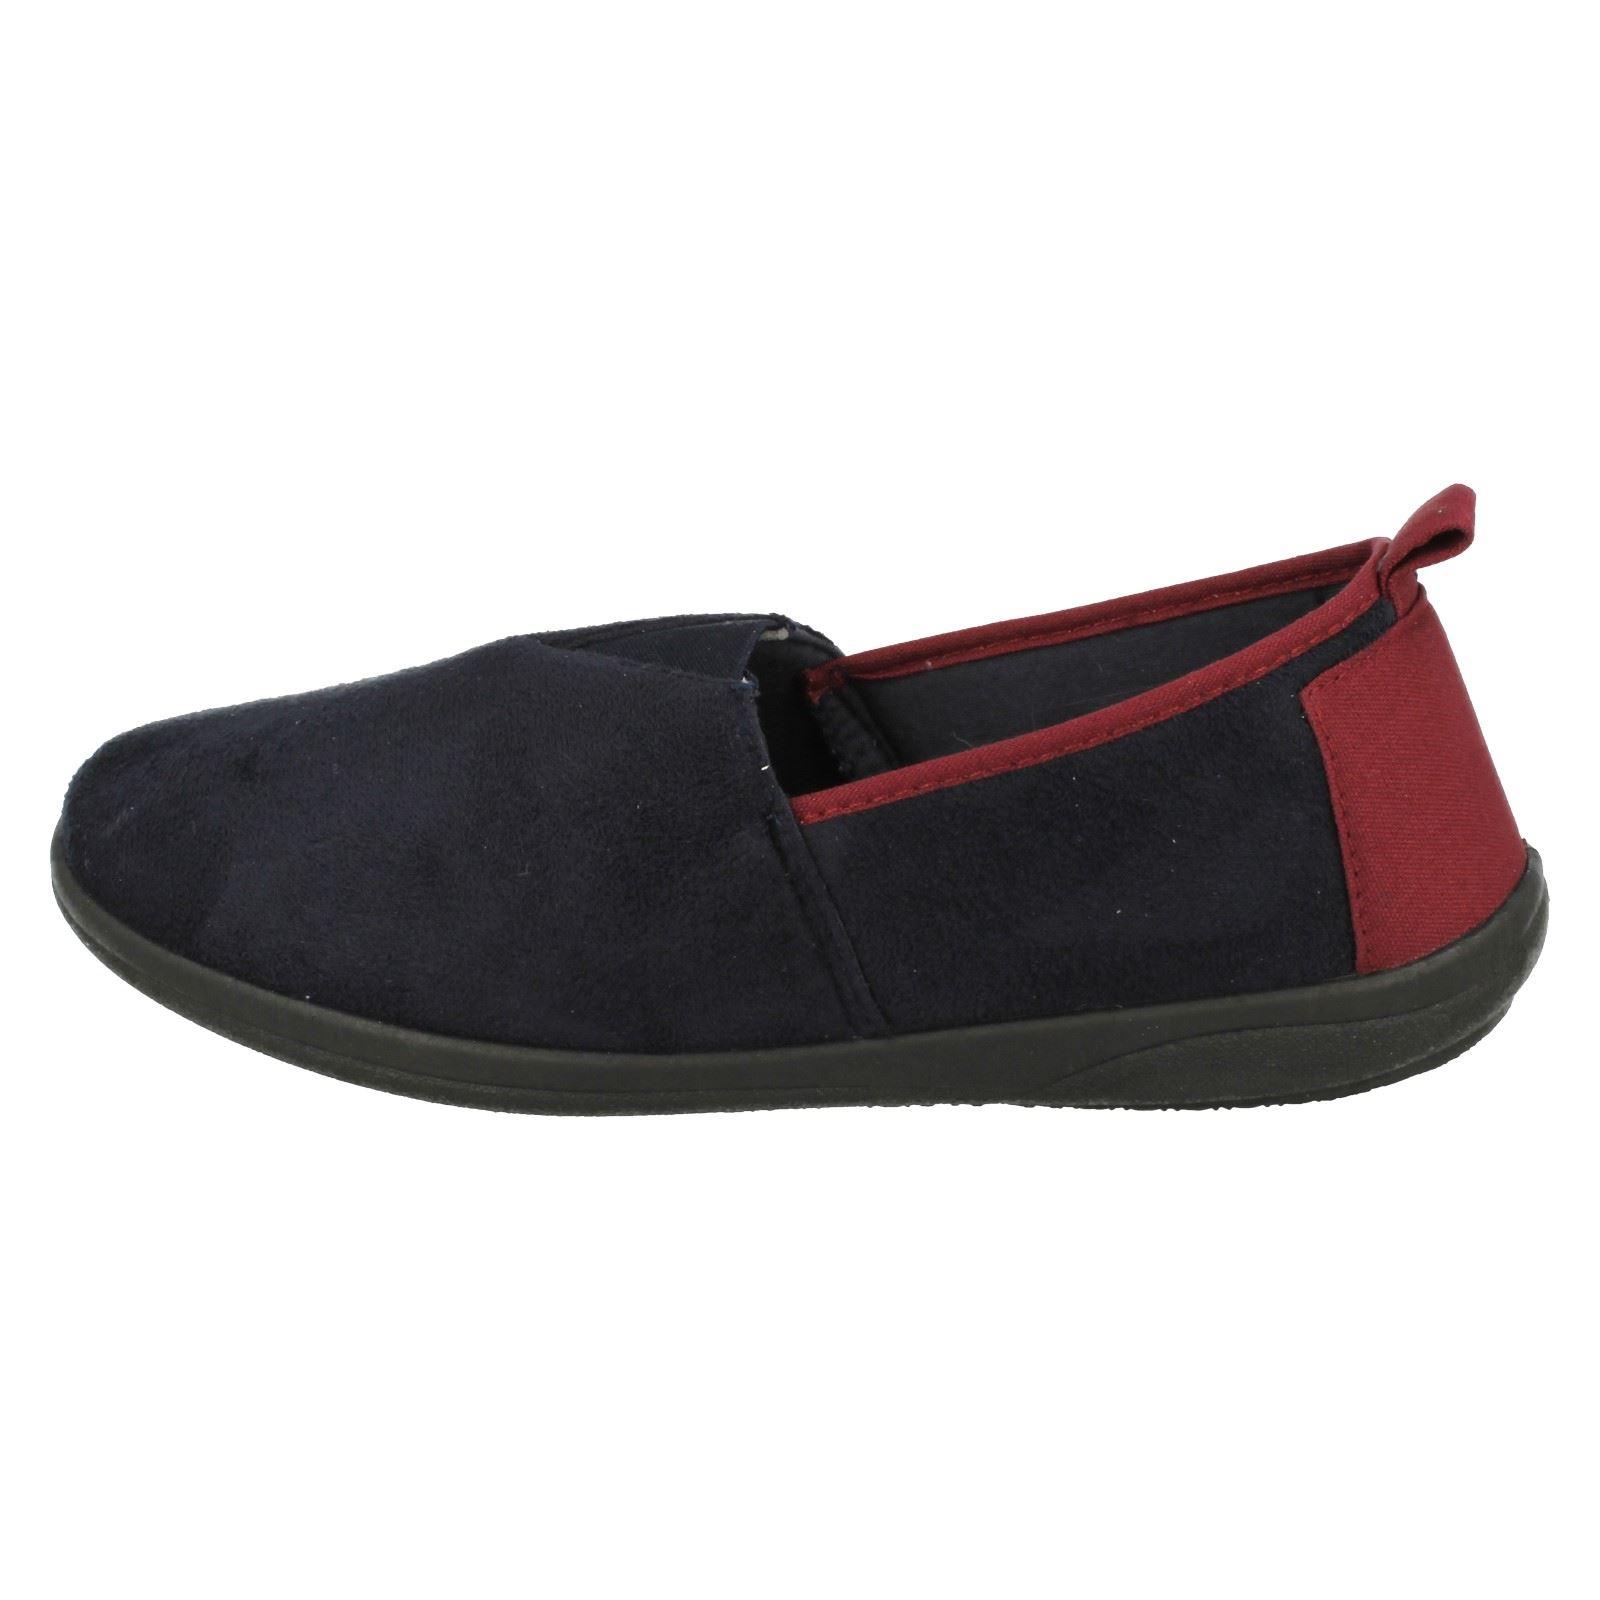 Orthopedic Mens Mule Shoes